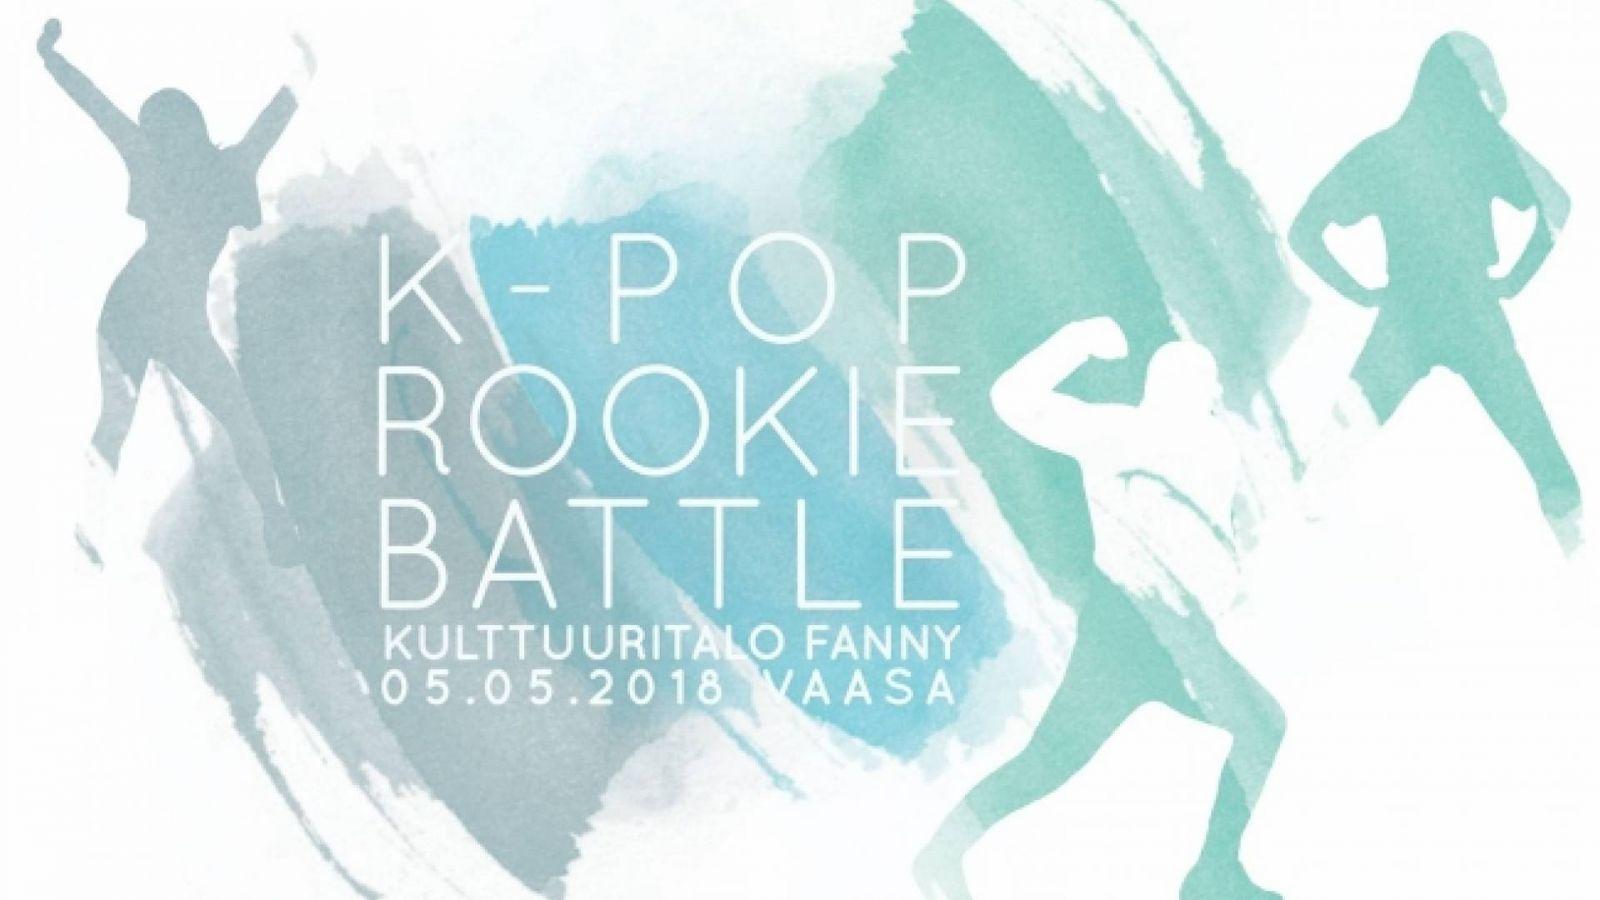 K-pop Rookie Battle -tanssikilpailu Vaasassa © K-Pop Suomi. All Rights Reserved.